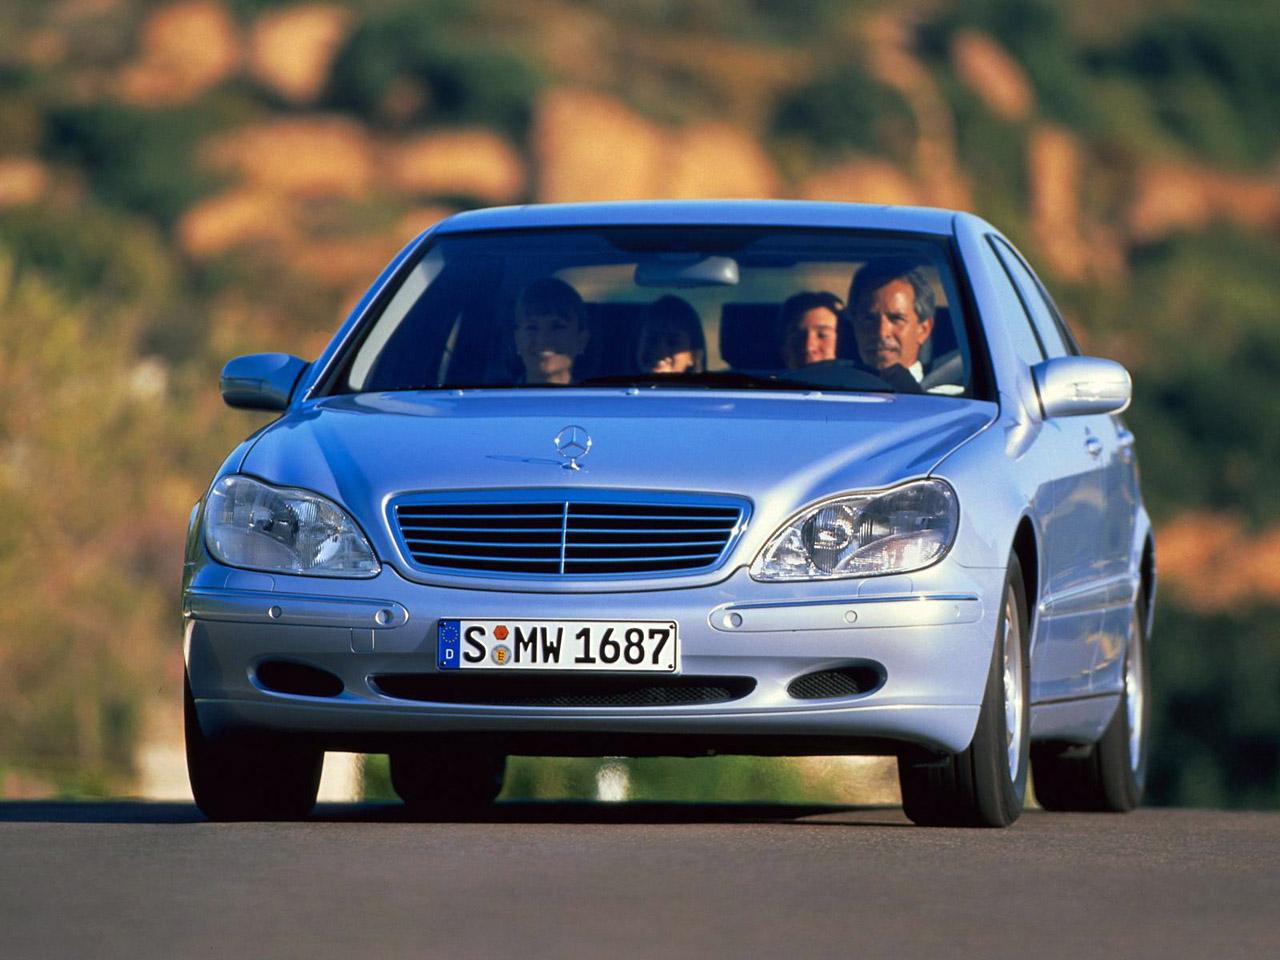 mercedes s klasse s320 w220 1998 2002 mercedes s klasse s320 w220 1998 2002 photo 13 car in. Black Bedroom Furniture Sets. Home Design Ideas